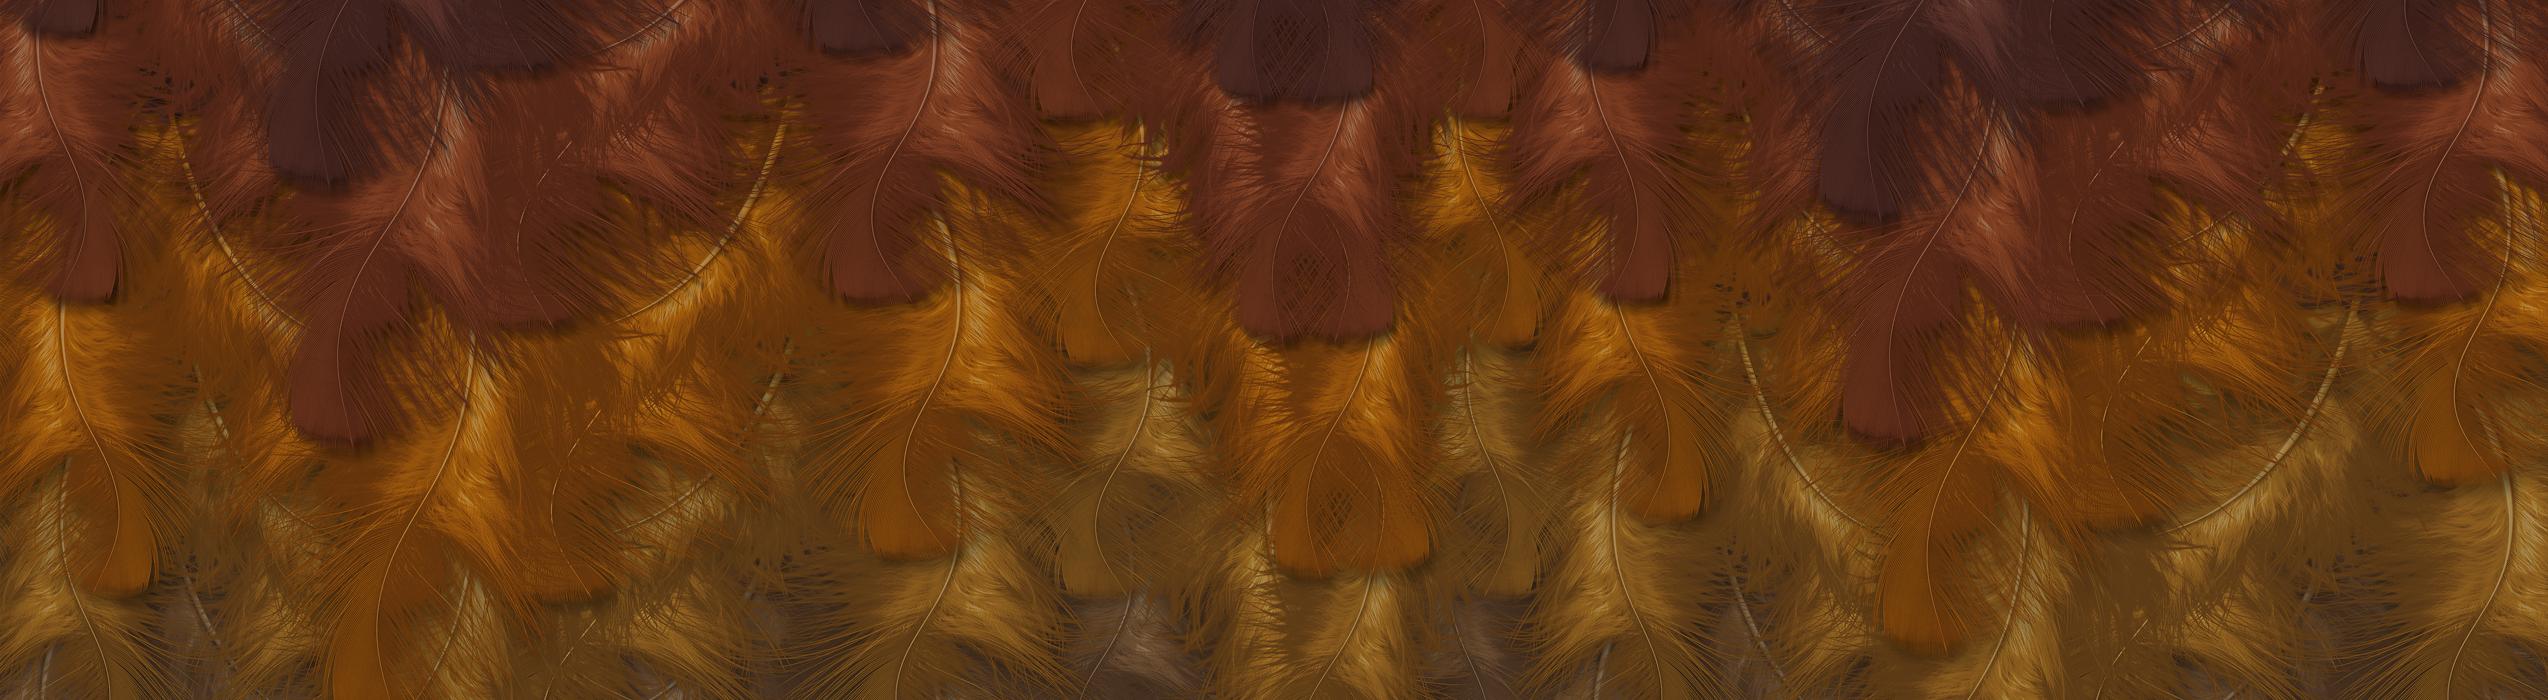 Feathers_artwork_ringel_design©